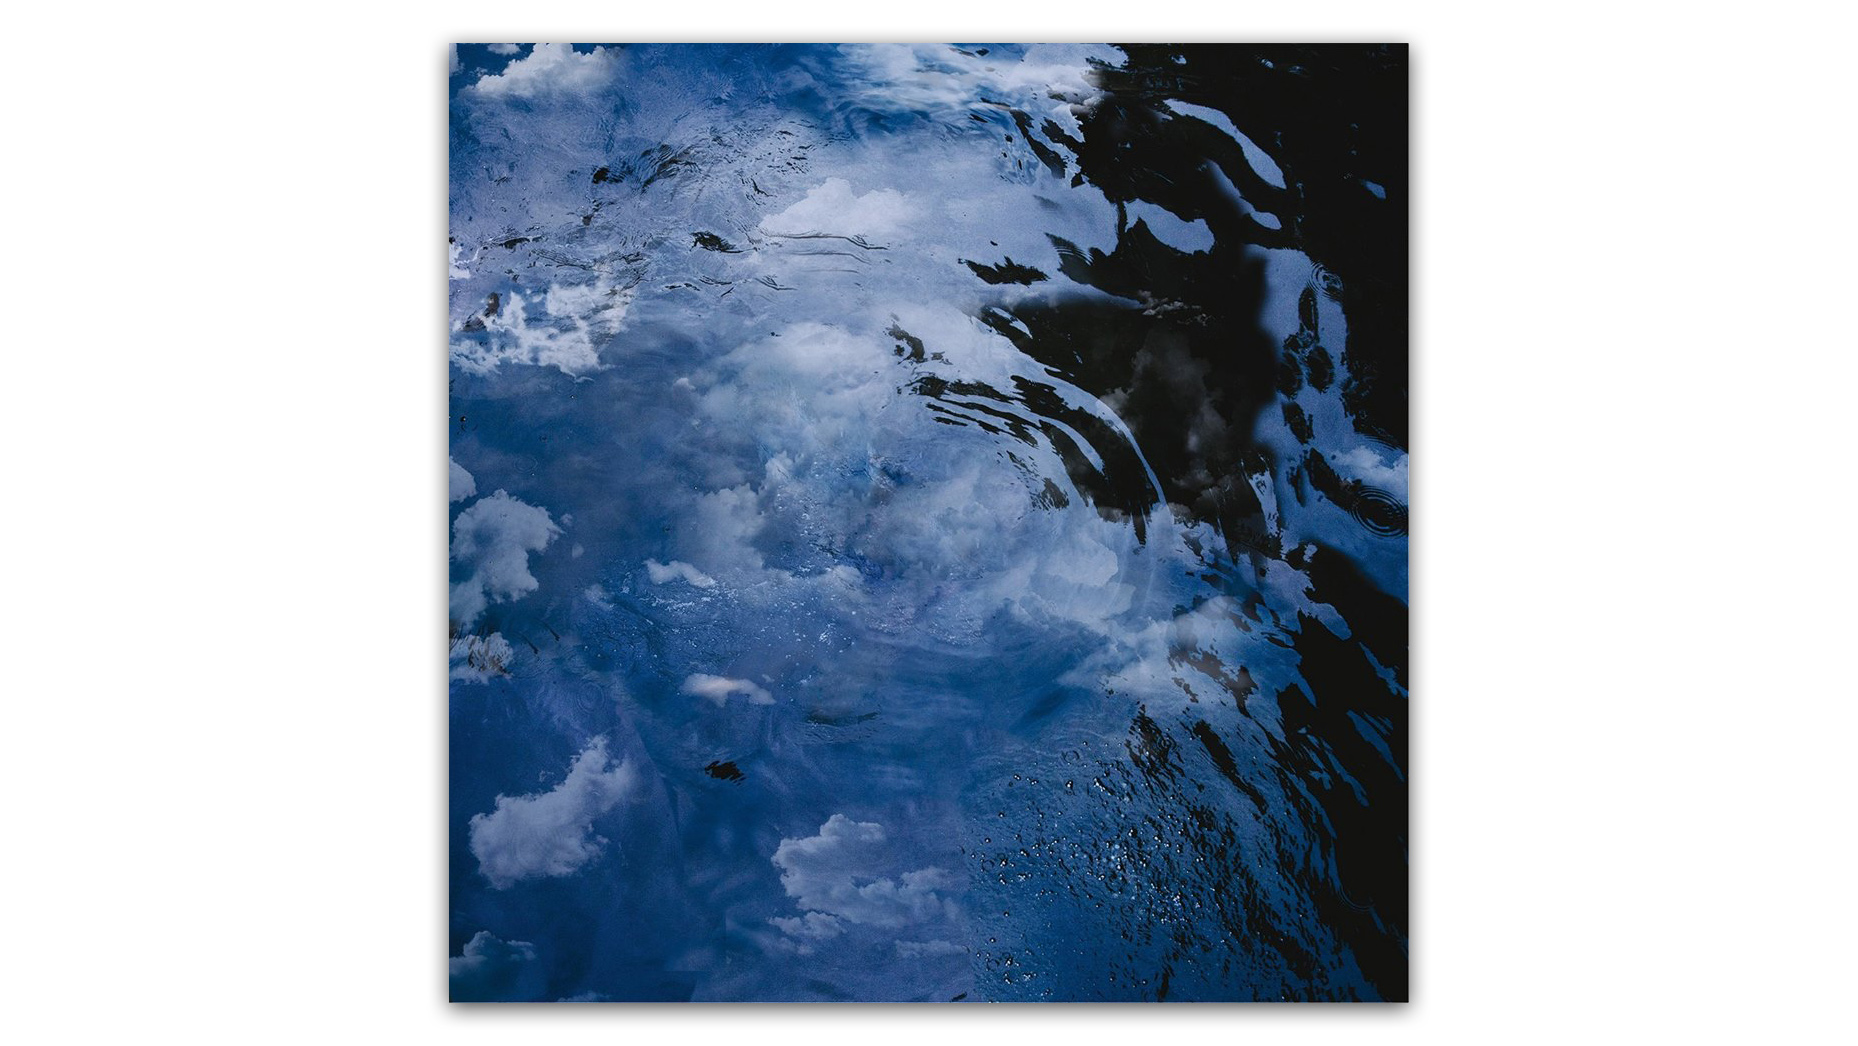 georgio bleu noir cover